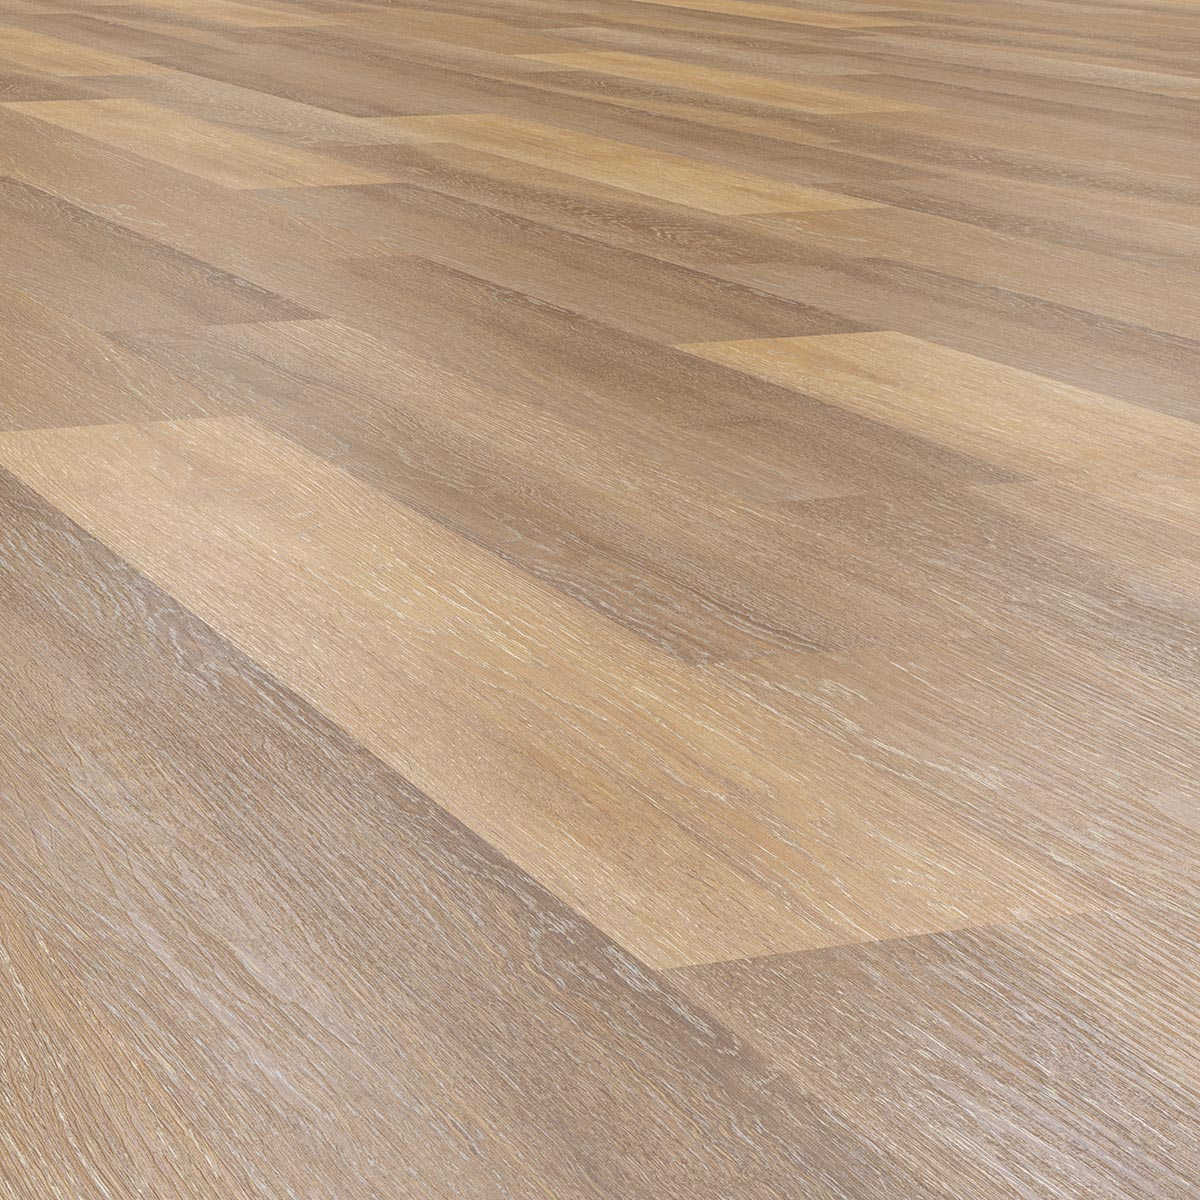 Natural Wood Luxury Vinyl Flooring